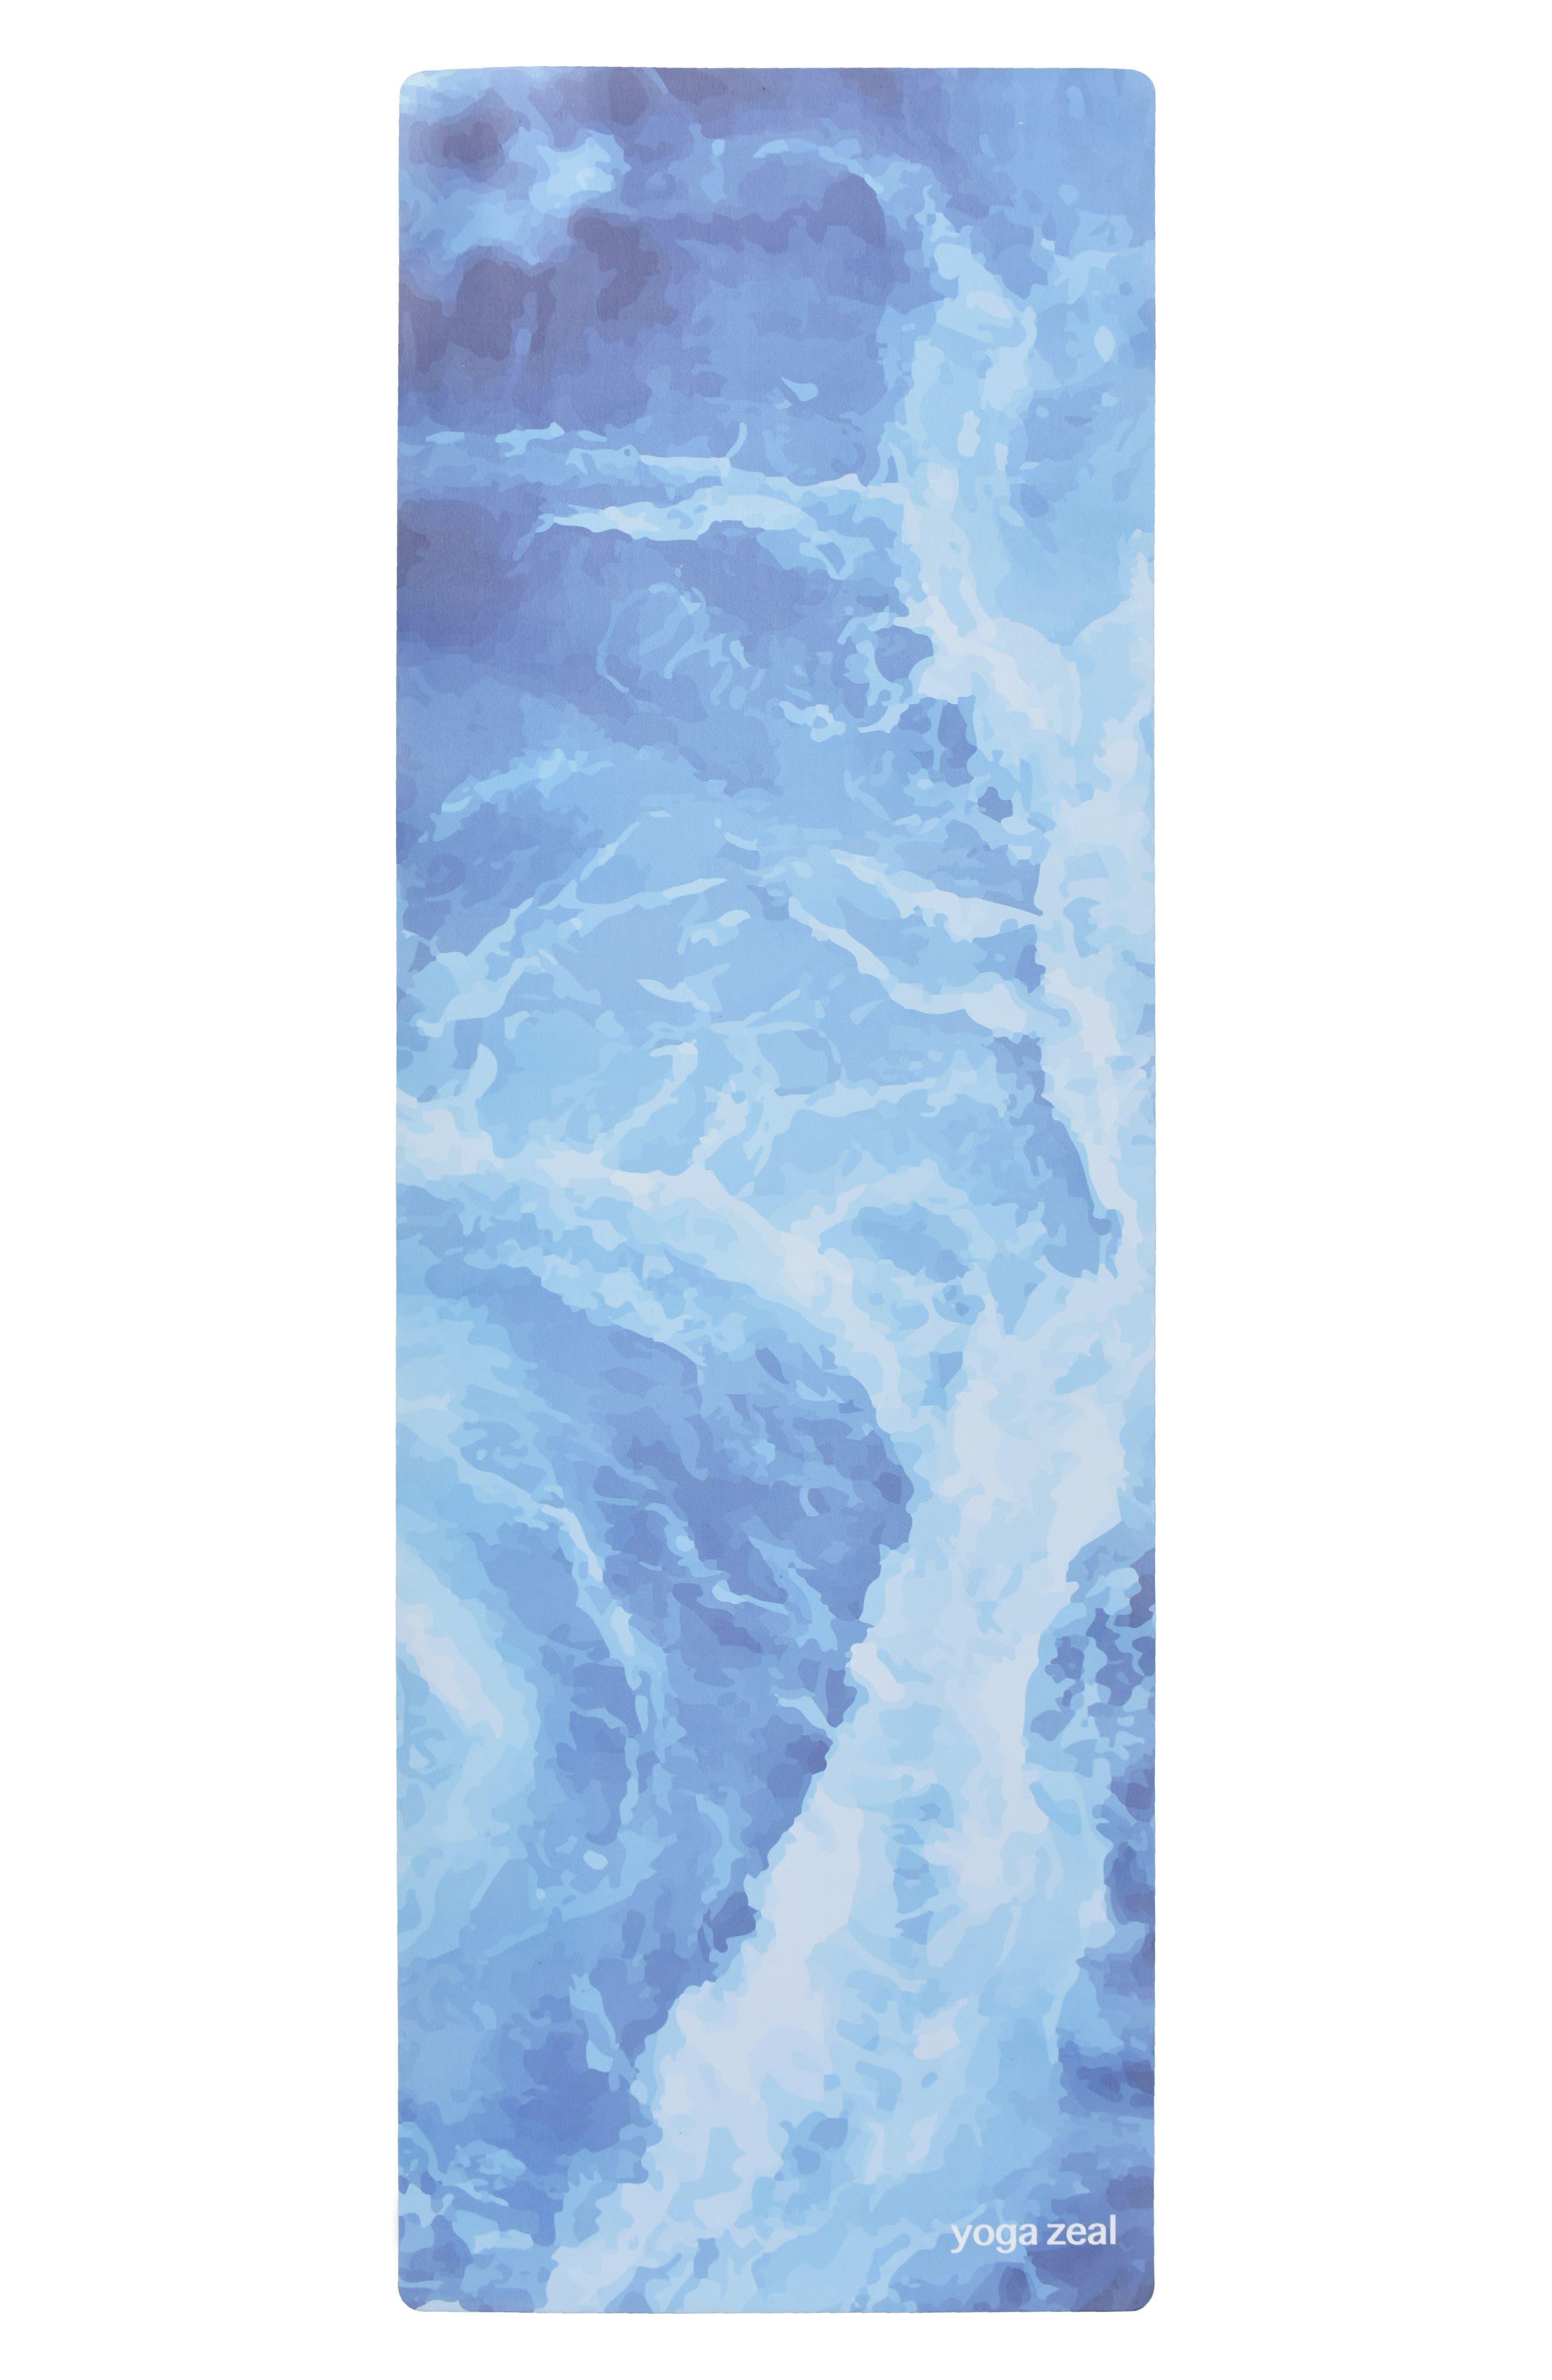 Ocean Print Yoga Mat,                             Main thumbnail 1, color,                             BLUE